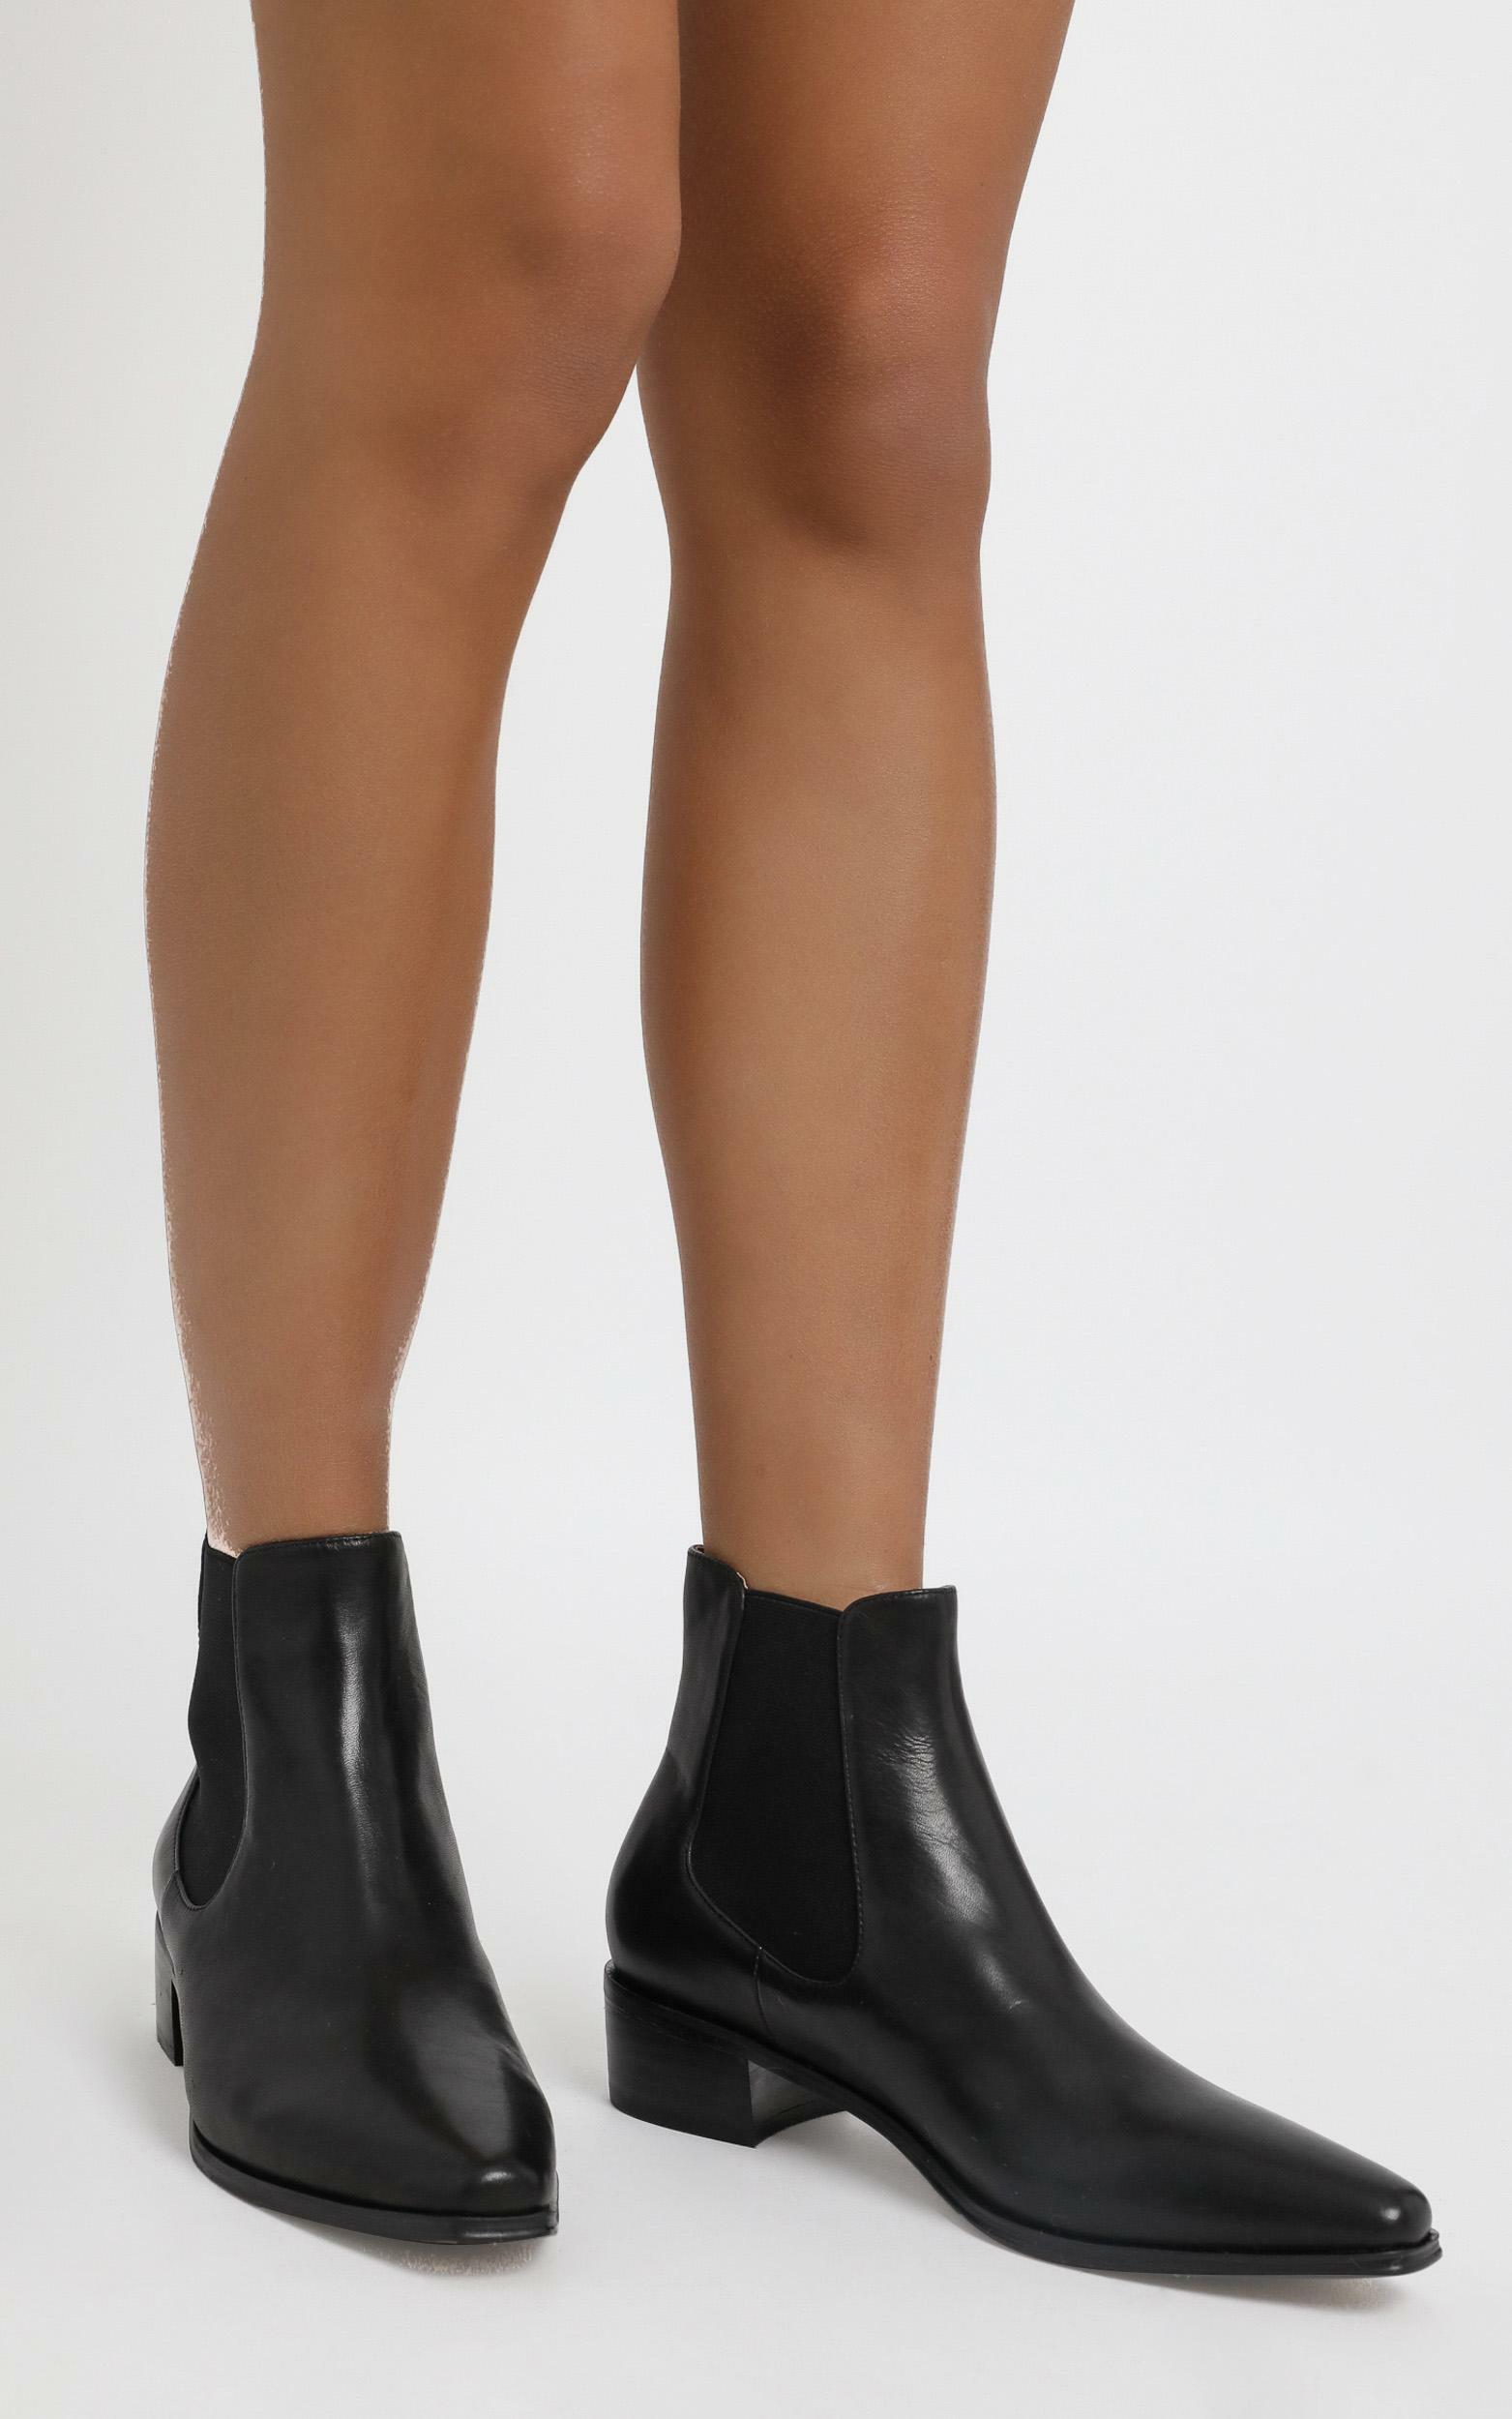 Alias Mae - Yasmyn Boots in Black Burnished - 5.5, Black, hi-res image number null